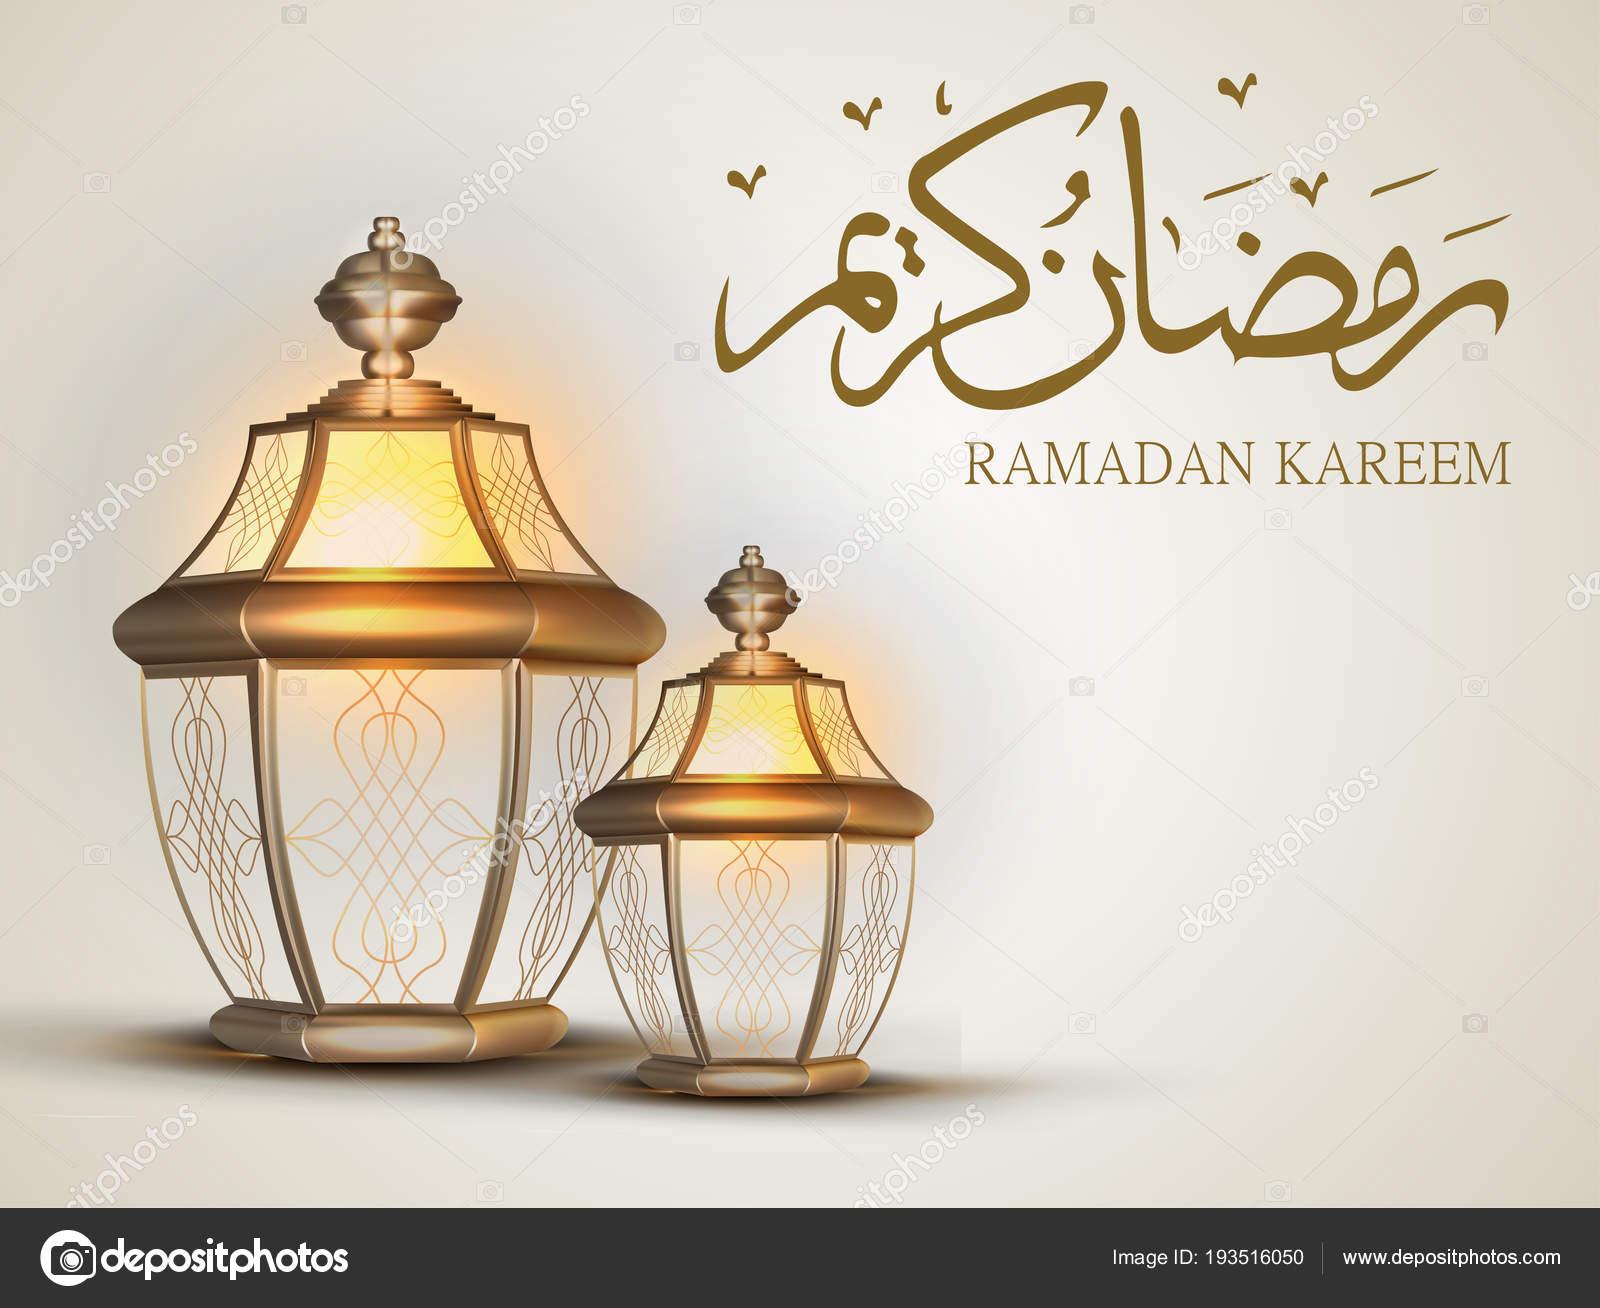 Ramadan kareem islamic greeting design line mosque dome with arabic ramadan kareem islamic greeting design line mosque dome with arabic pattern lantern and calligraphy stock m4hsunfo Gallery